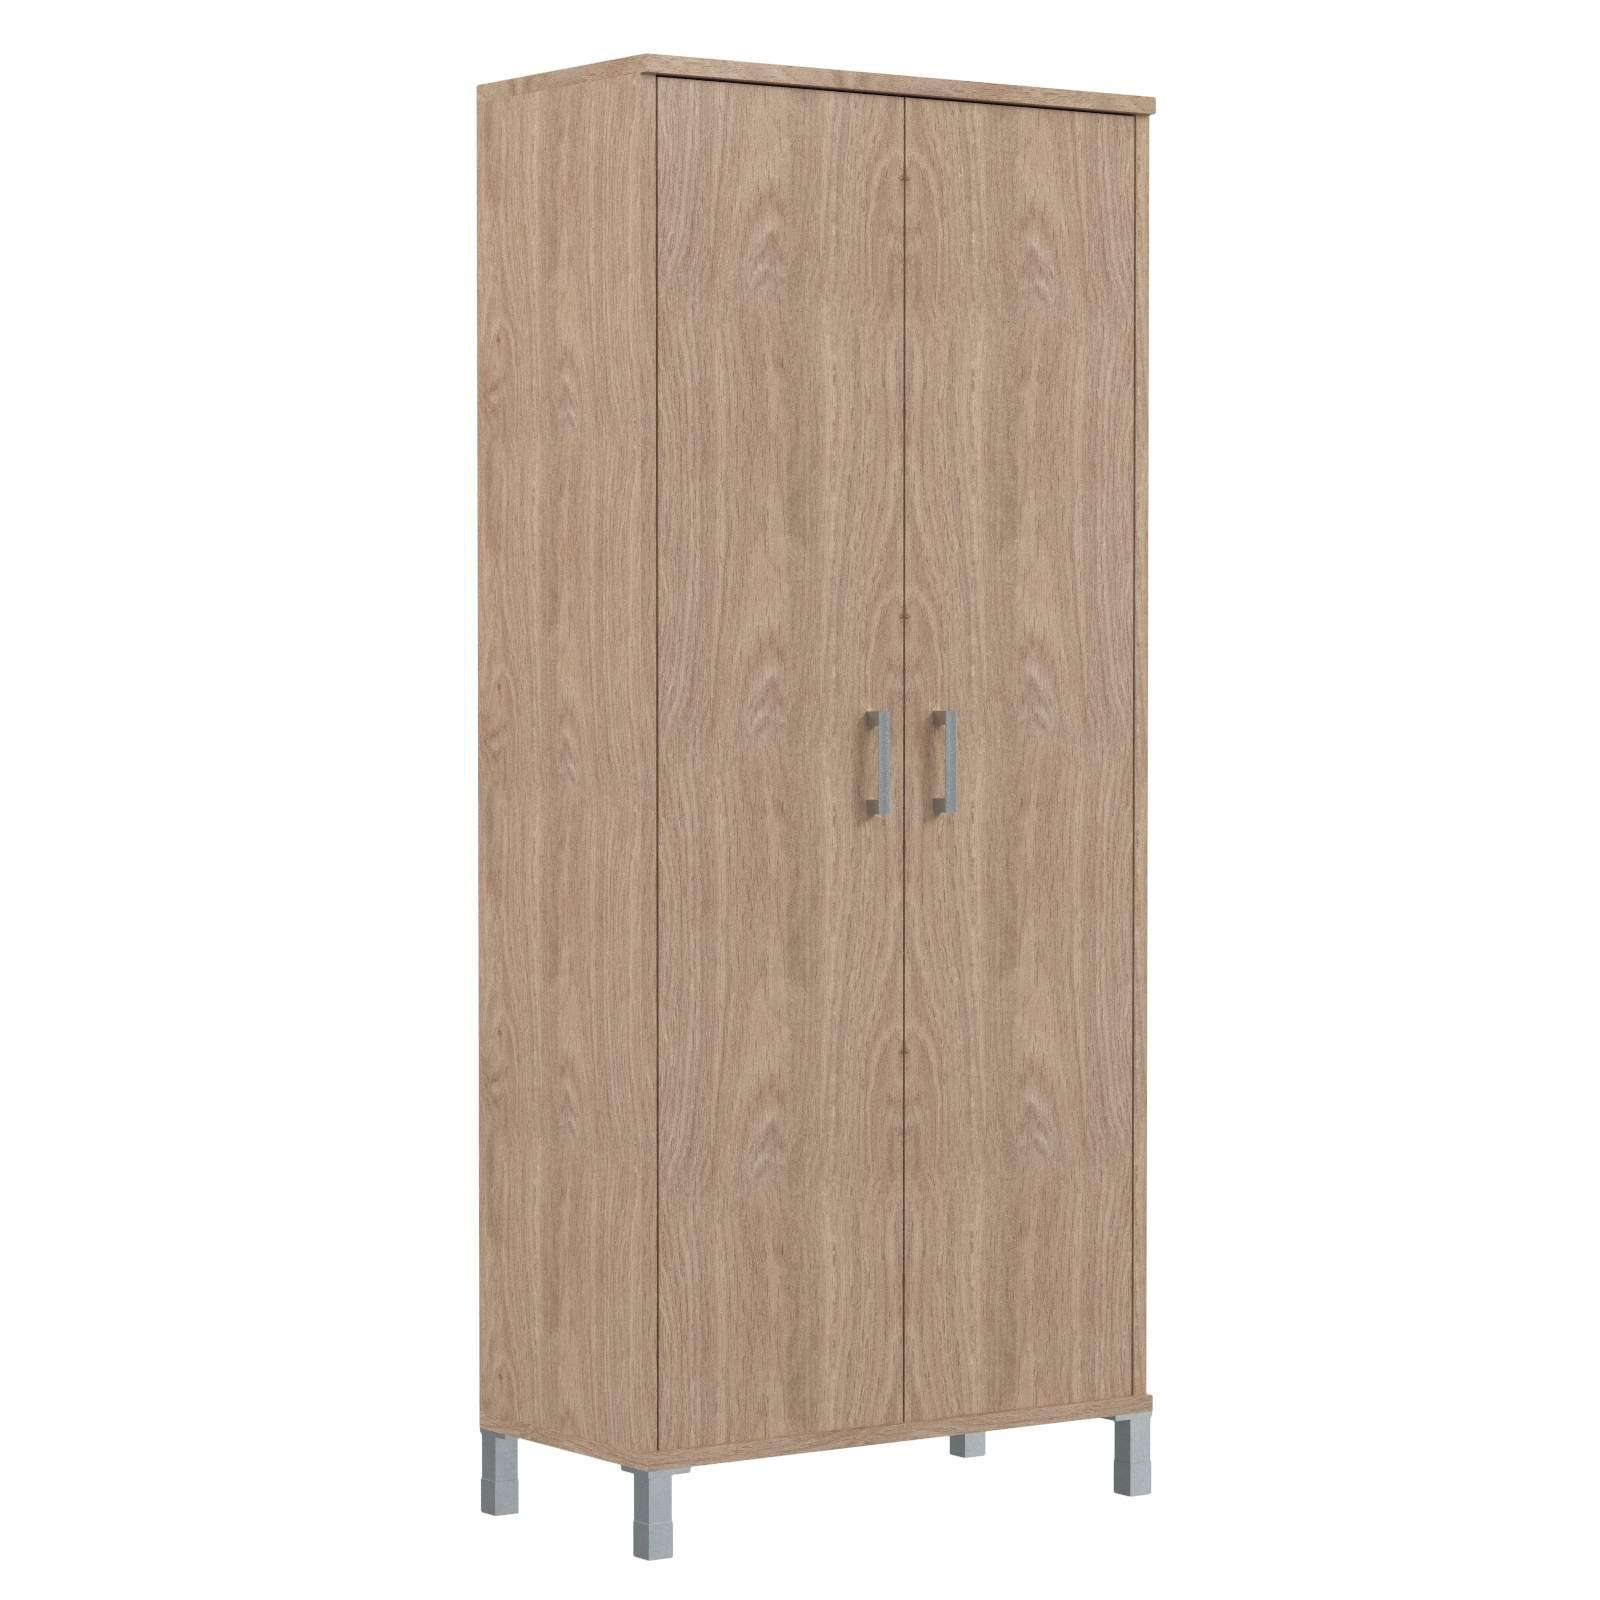 Шкаф высокий с глухими дверьми 900х435х2004